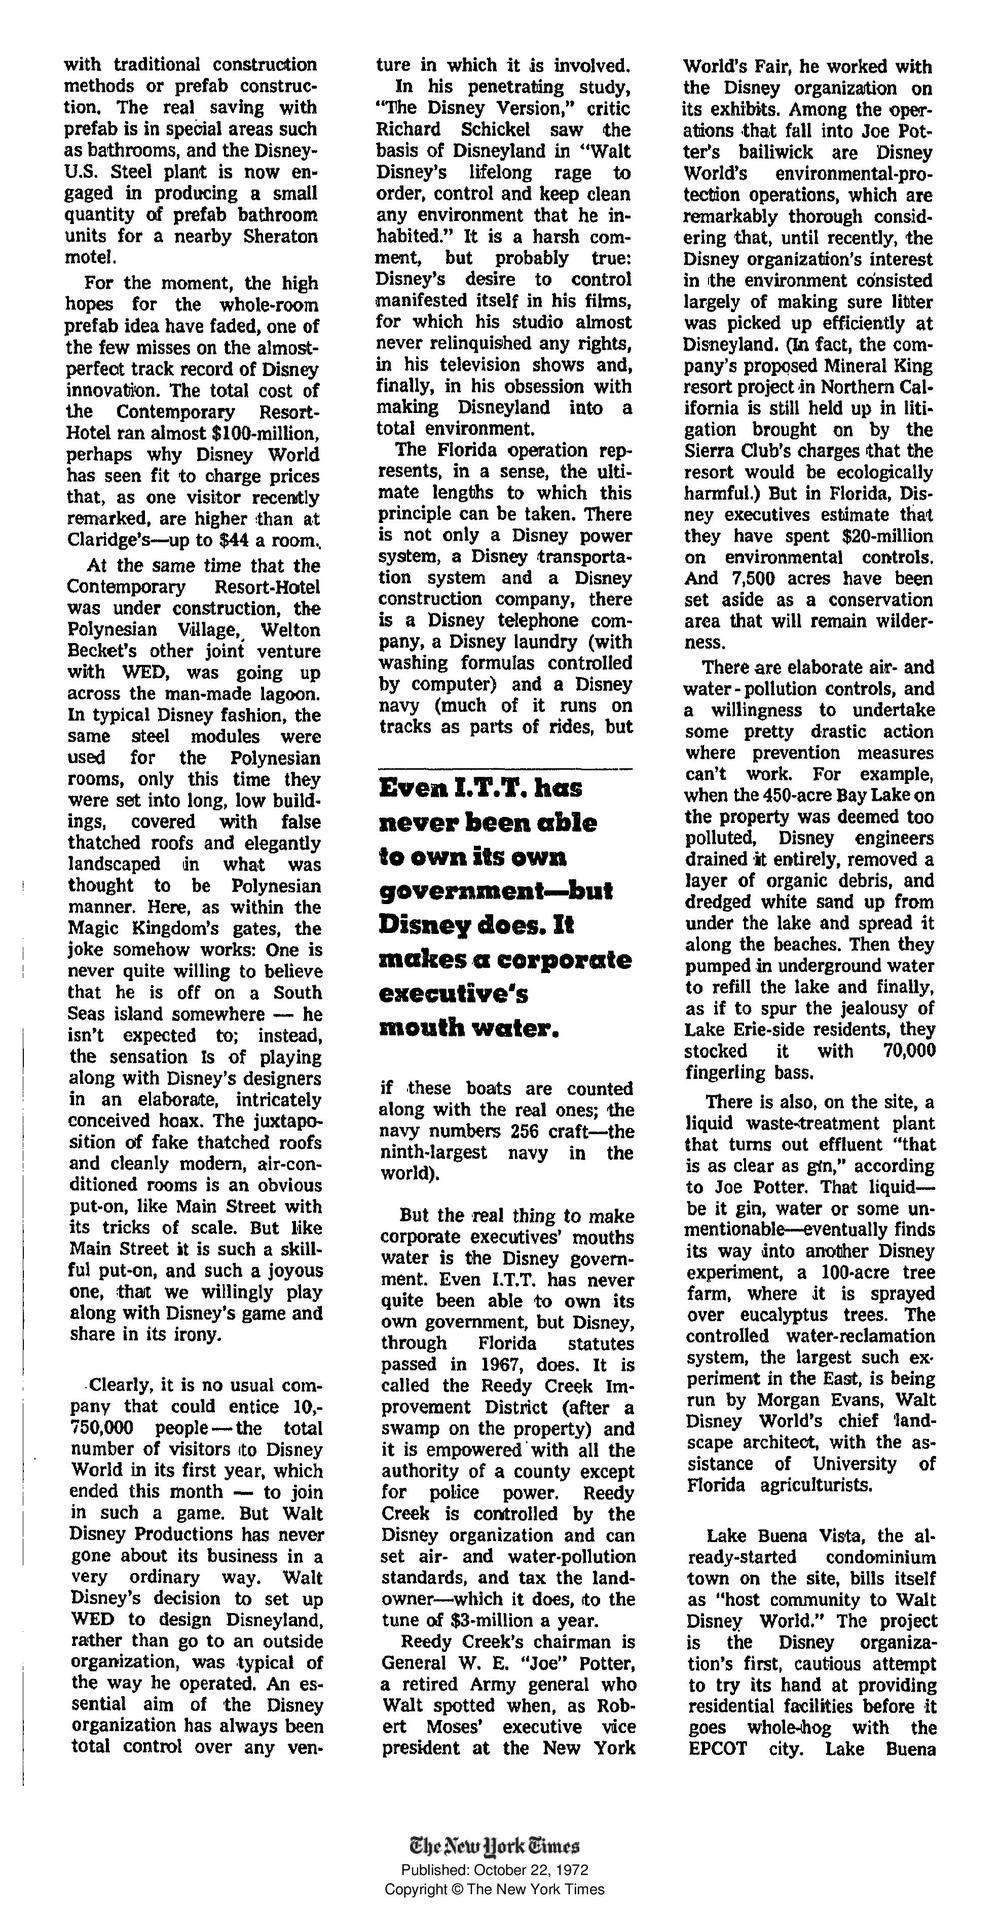 wdw1972-page-009.jpg